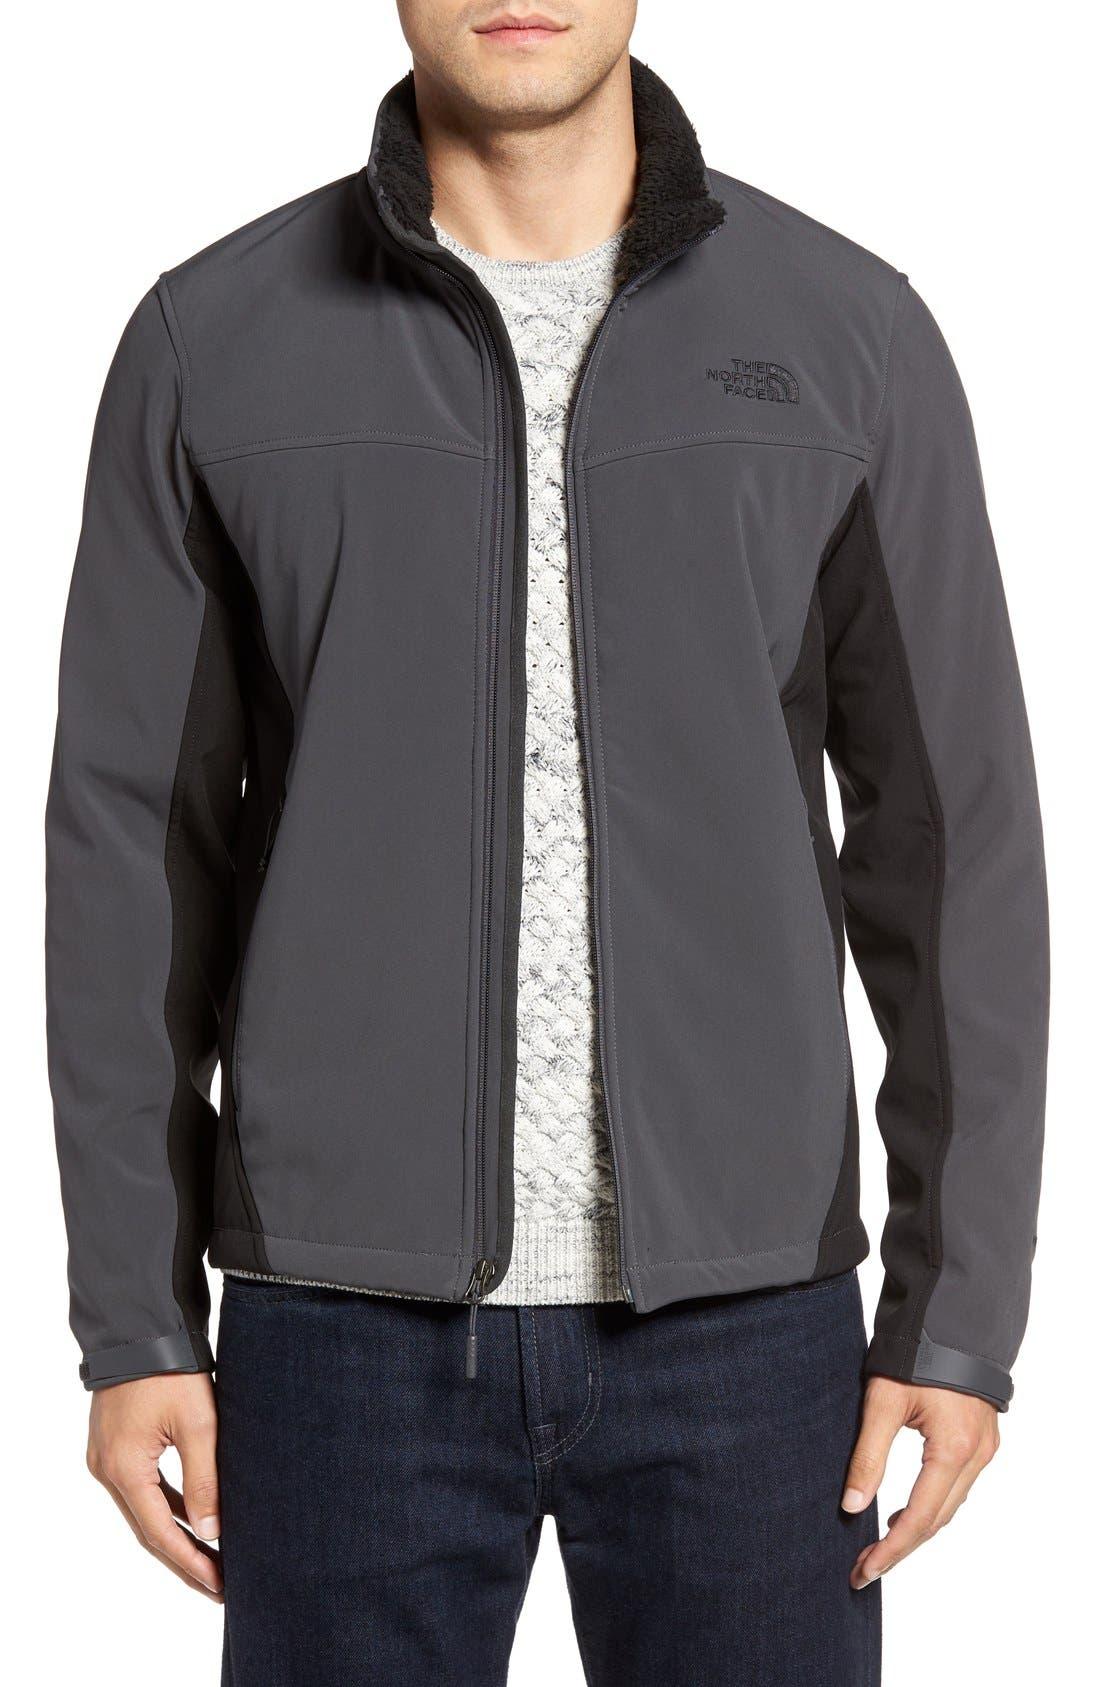 'Apex Chromium' Waterproof Thermal Jacket,                             Main thumbnail 1, color,                             Asphalt Grey/ Tnf Black